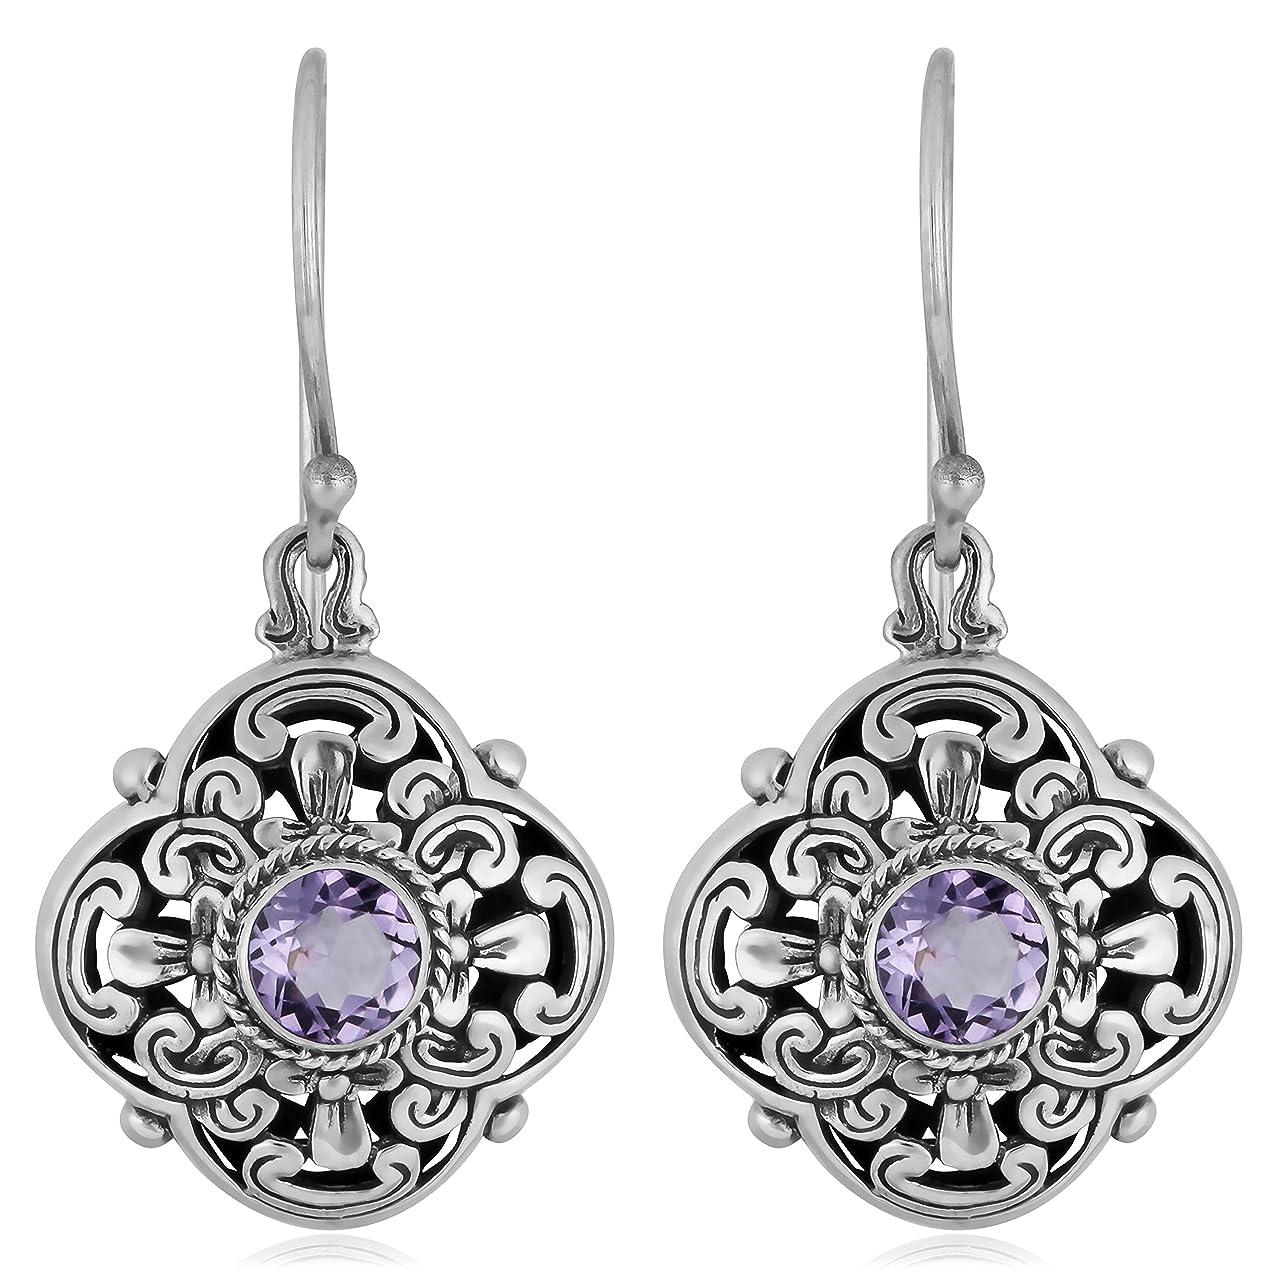 Artisanica Amethyst Sterling Silver Floral Artistic Dangle Earrings